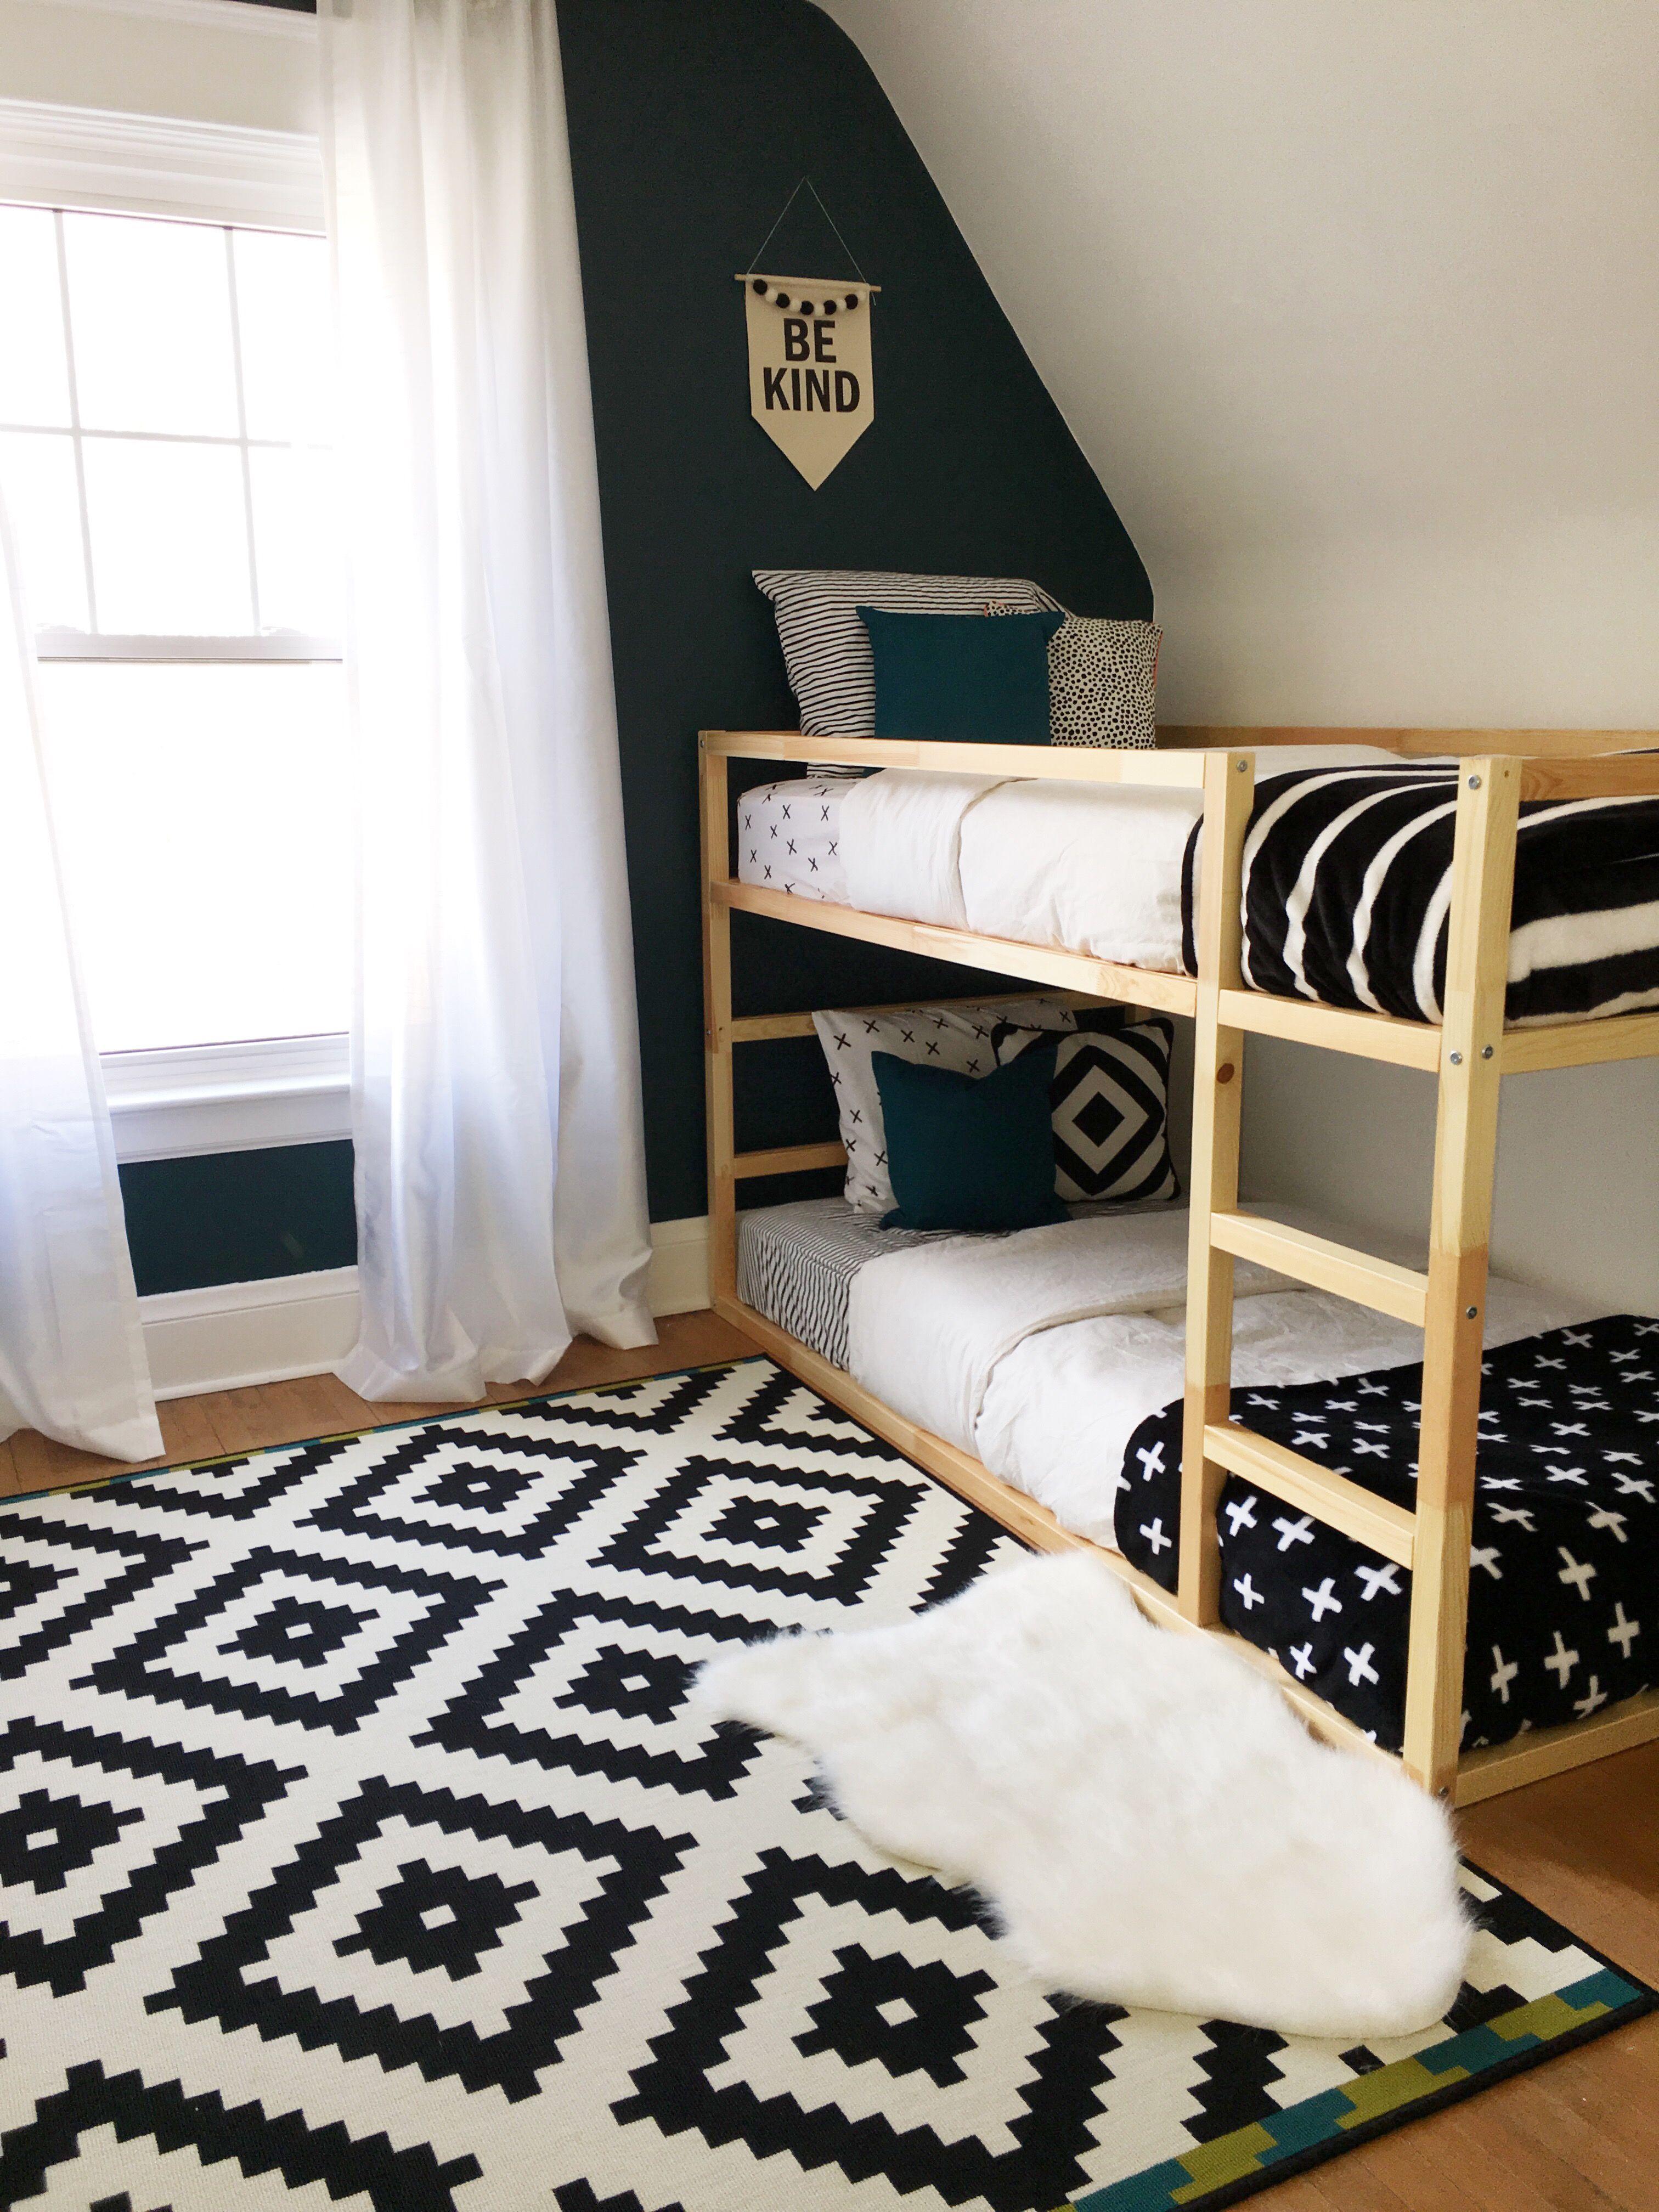 Ikea Bunks 27 Unbelievably Stunning Kids Bedroom Ideas You Should Try Teenbedroomideas Bedroomidea Kids Rooms Shared Neutral Kids Bedroom Kids Shared Bedroom